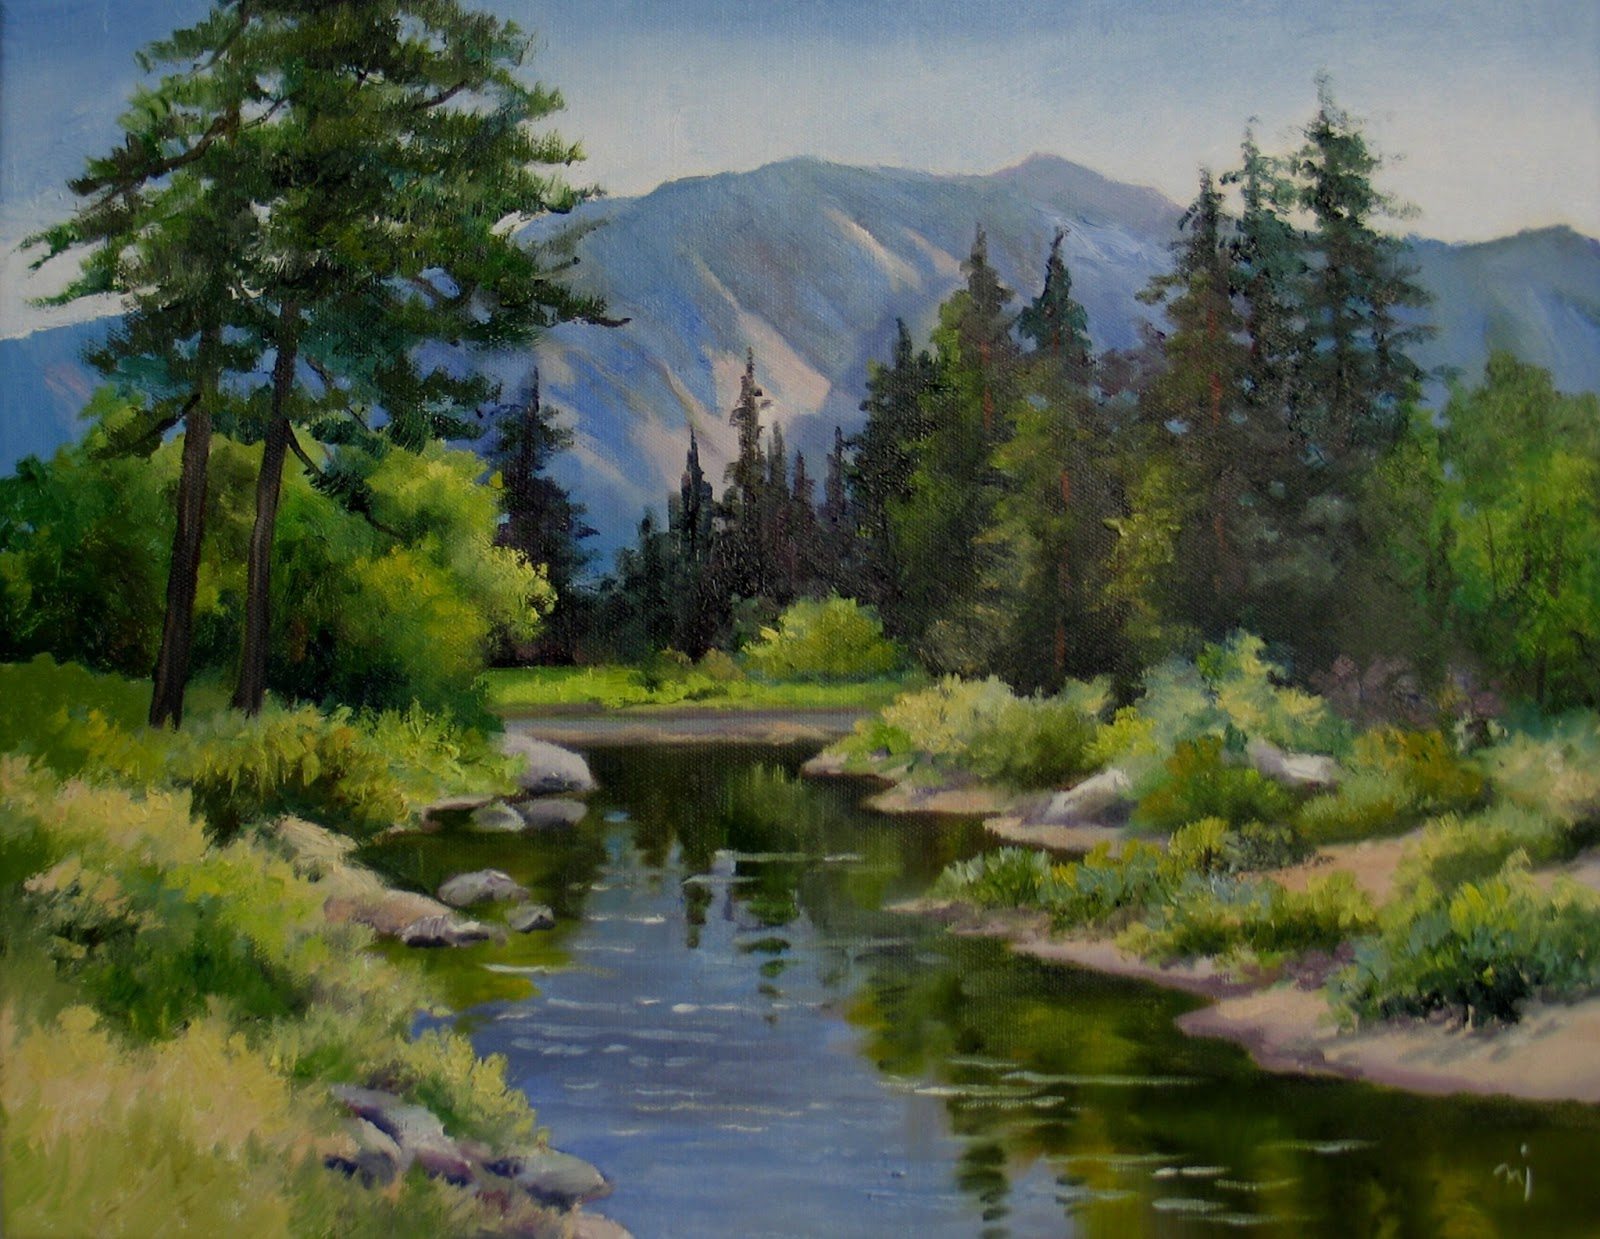 Nel S Everyday Painting 3 24 13 3 31 13